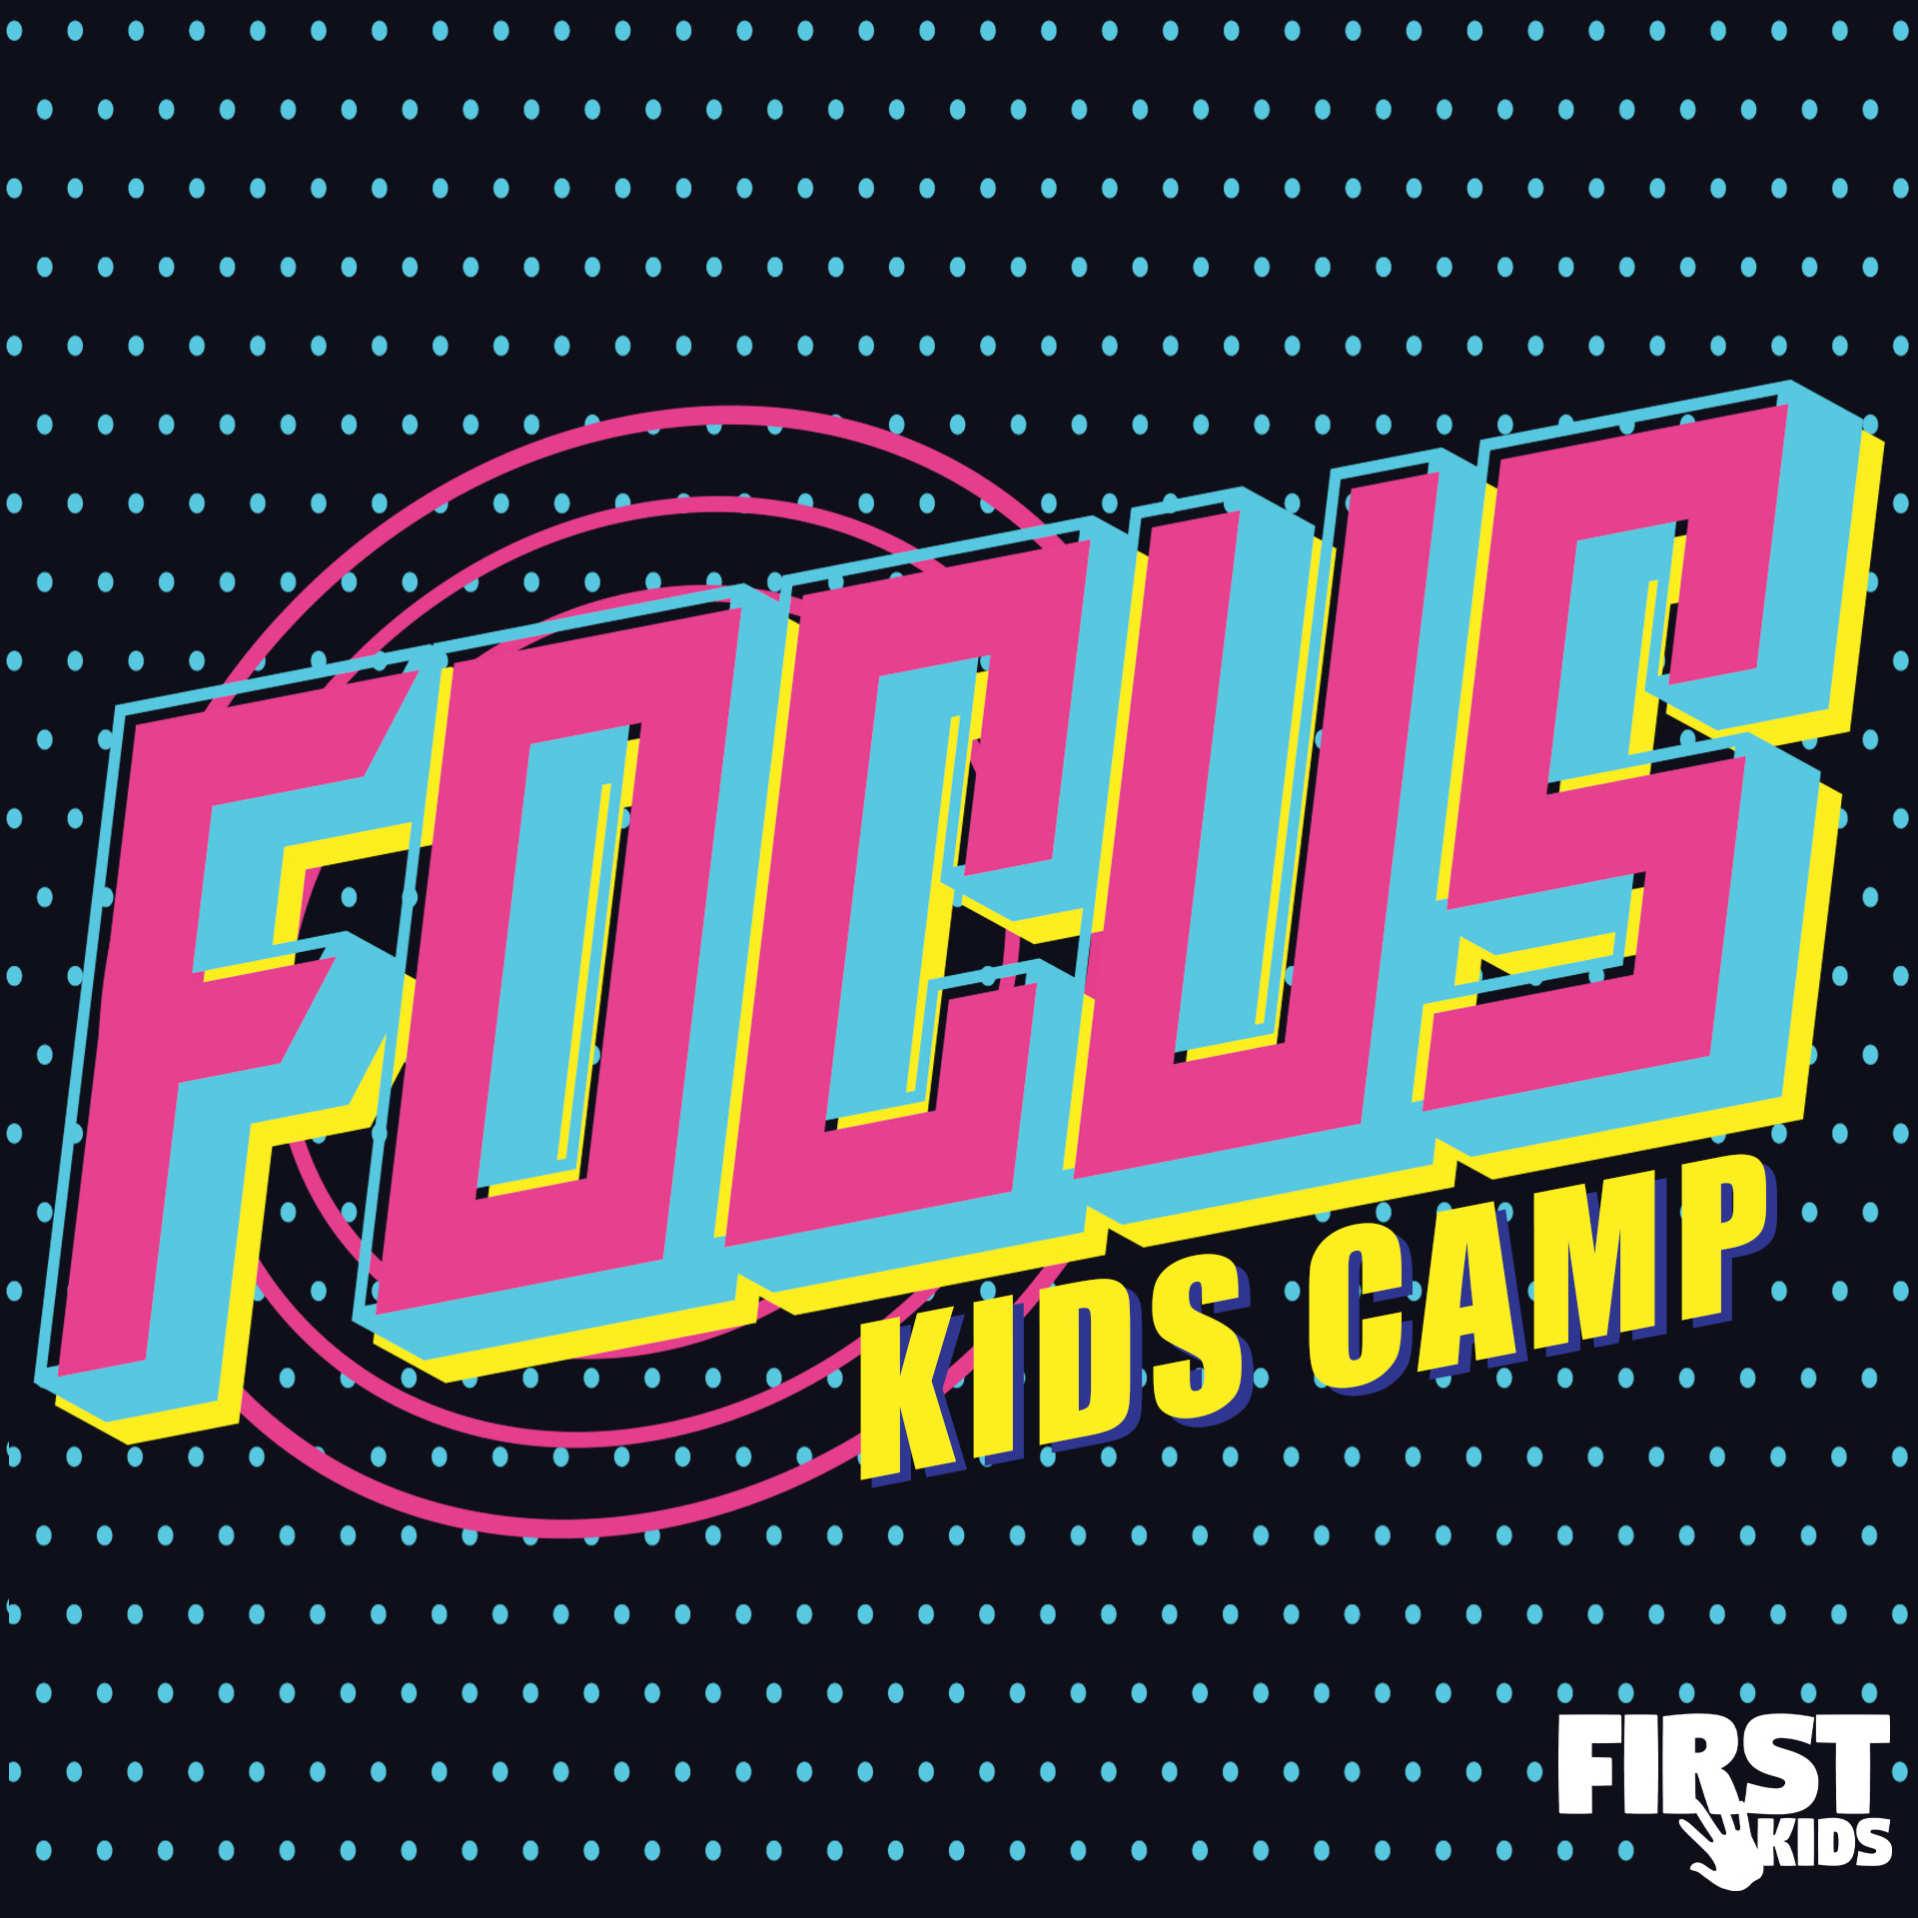 Kids Camp Square